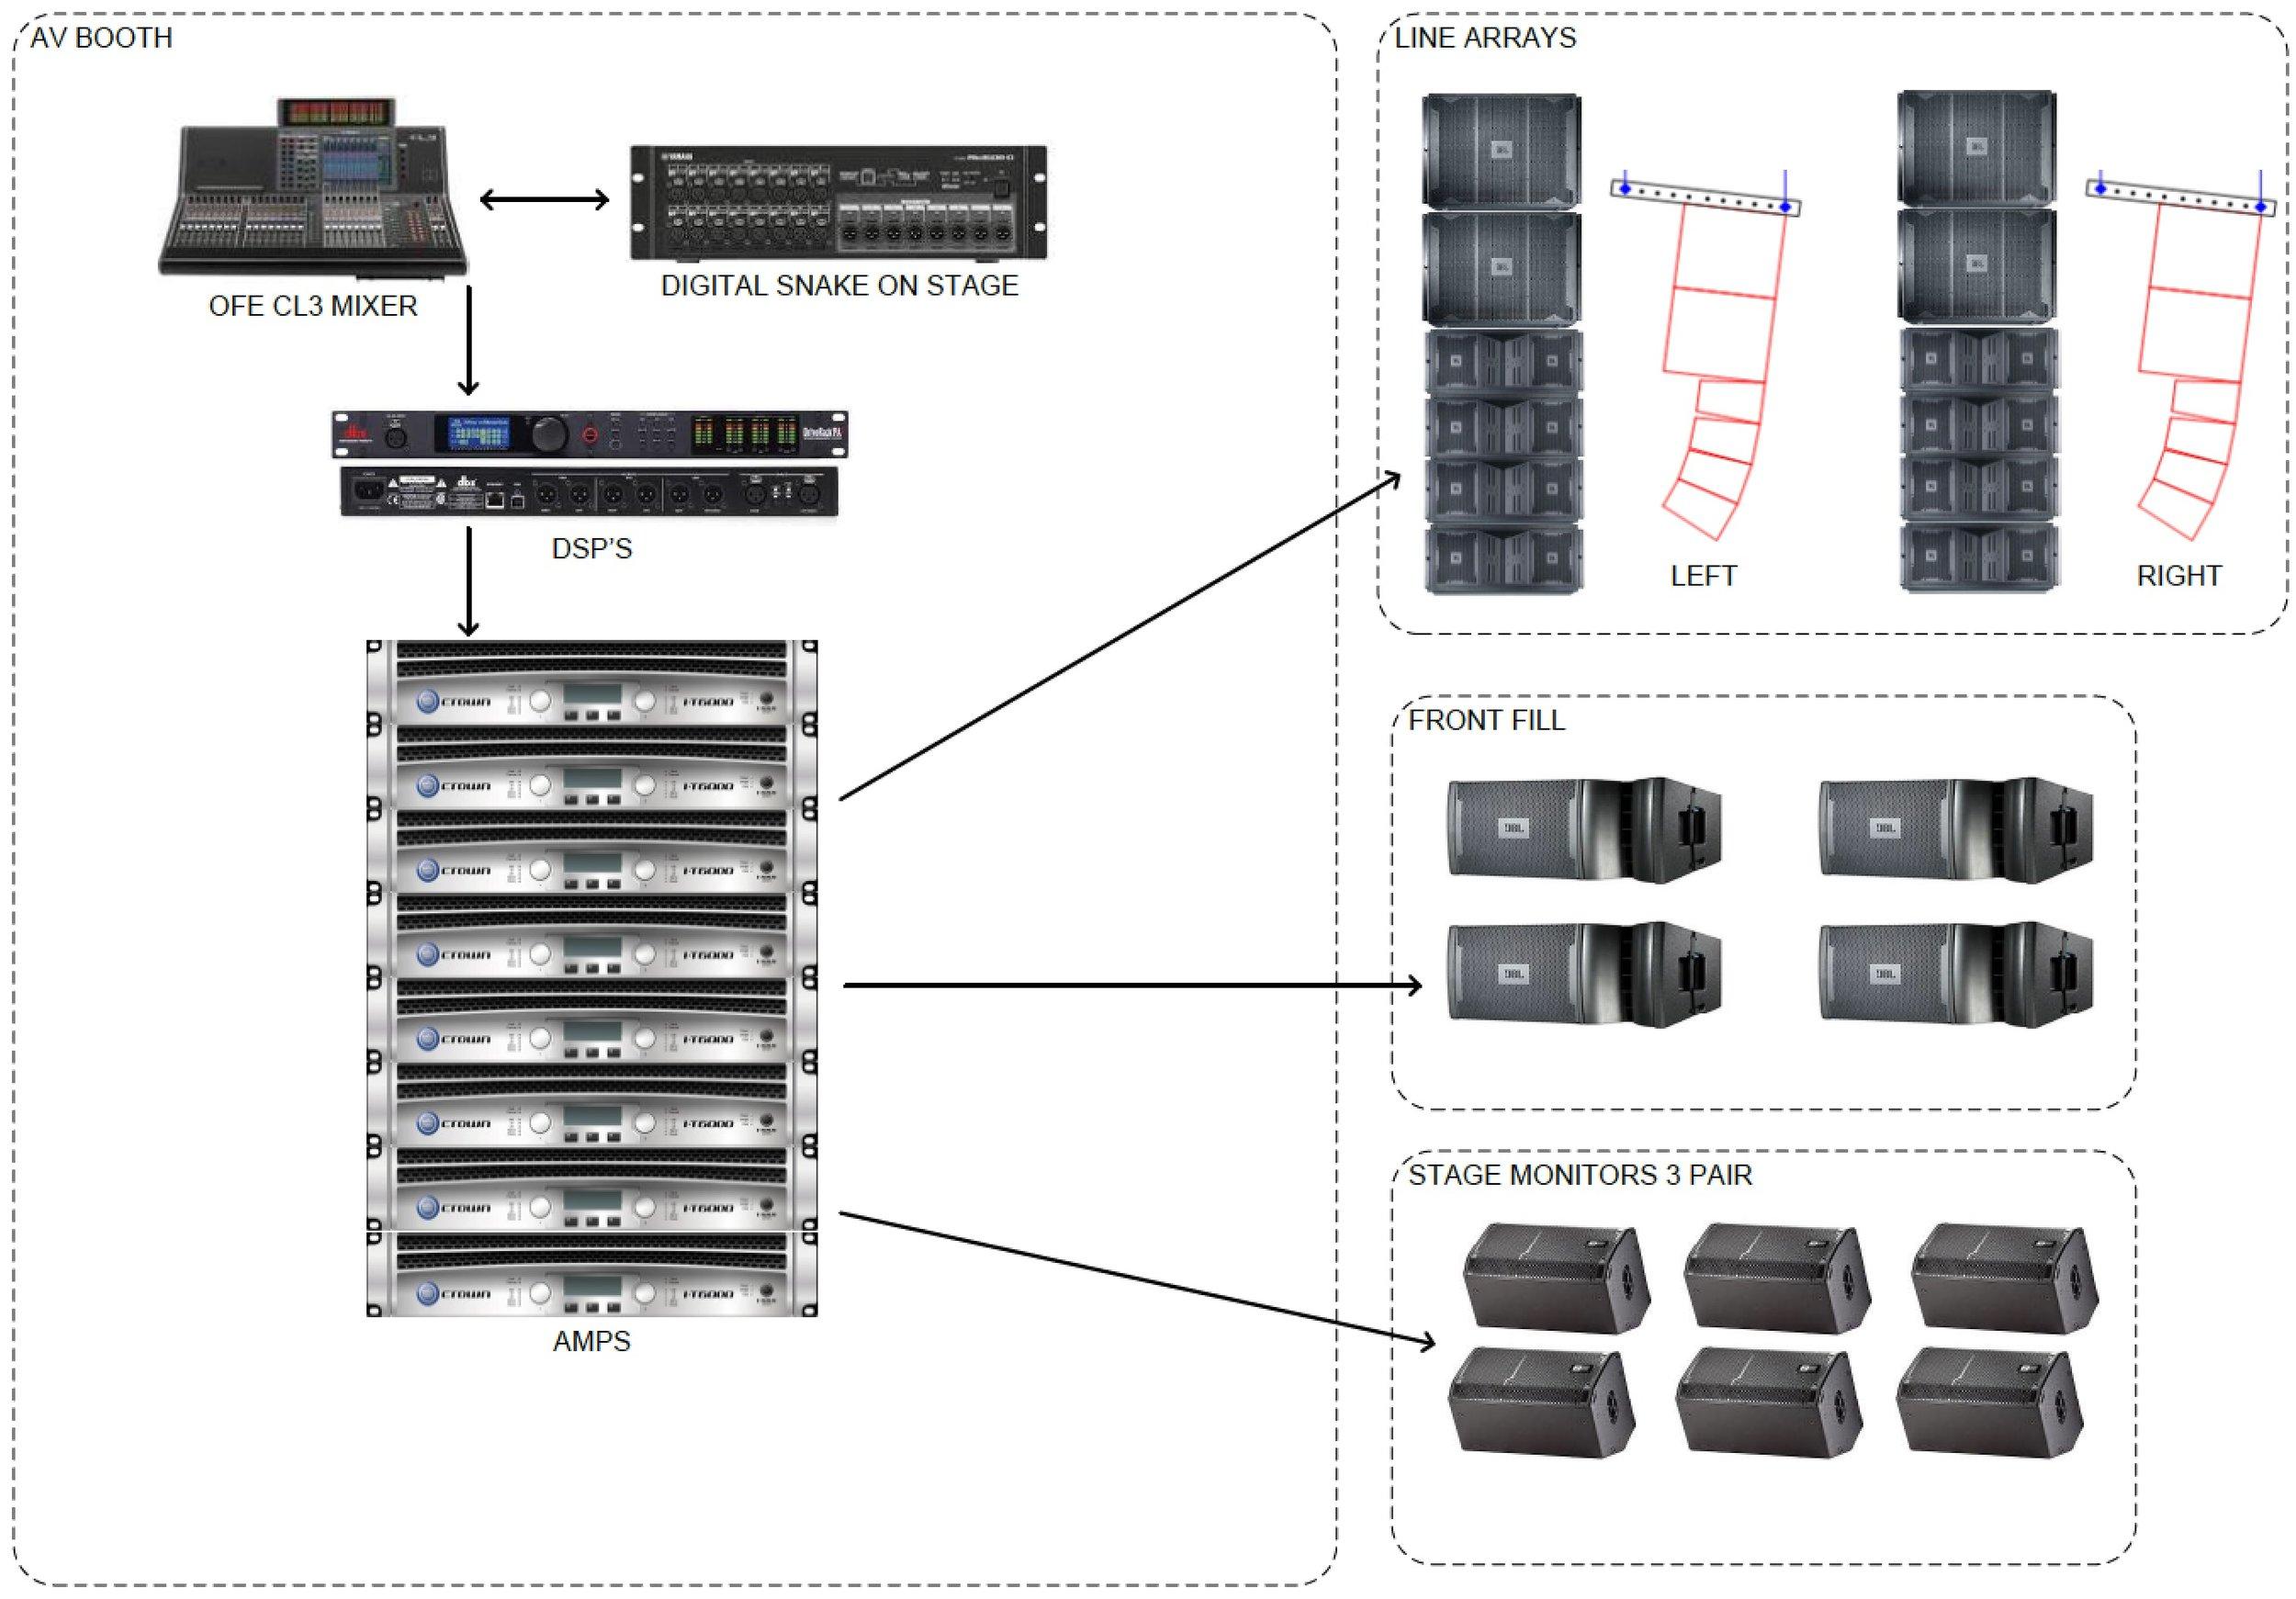 Bendpak Lift Wiring Diagram Challenger Lift Wiring Diagram